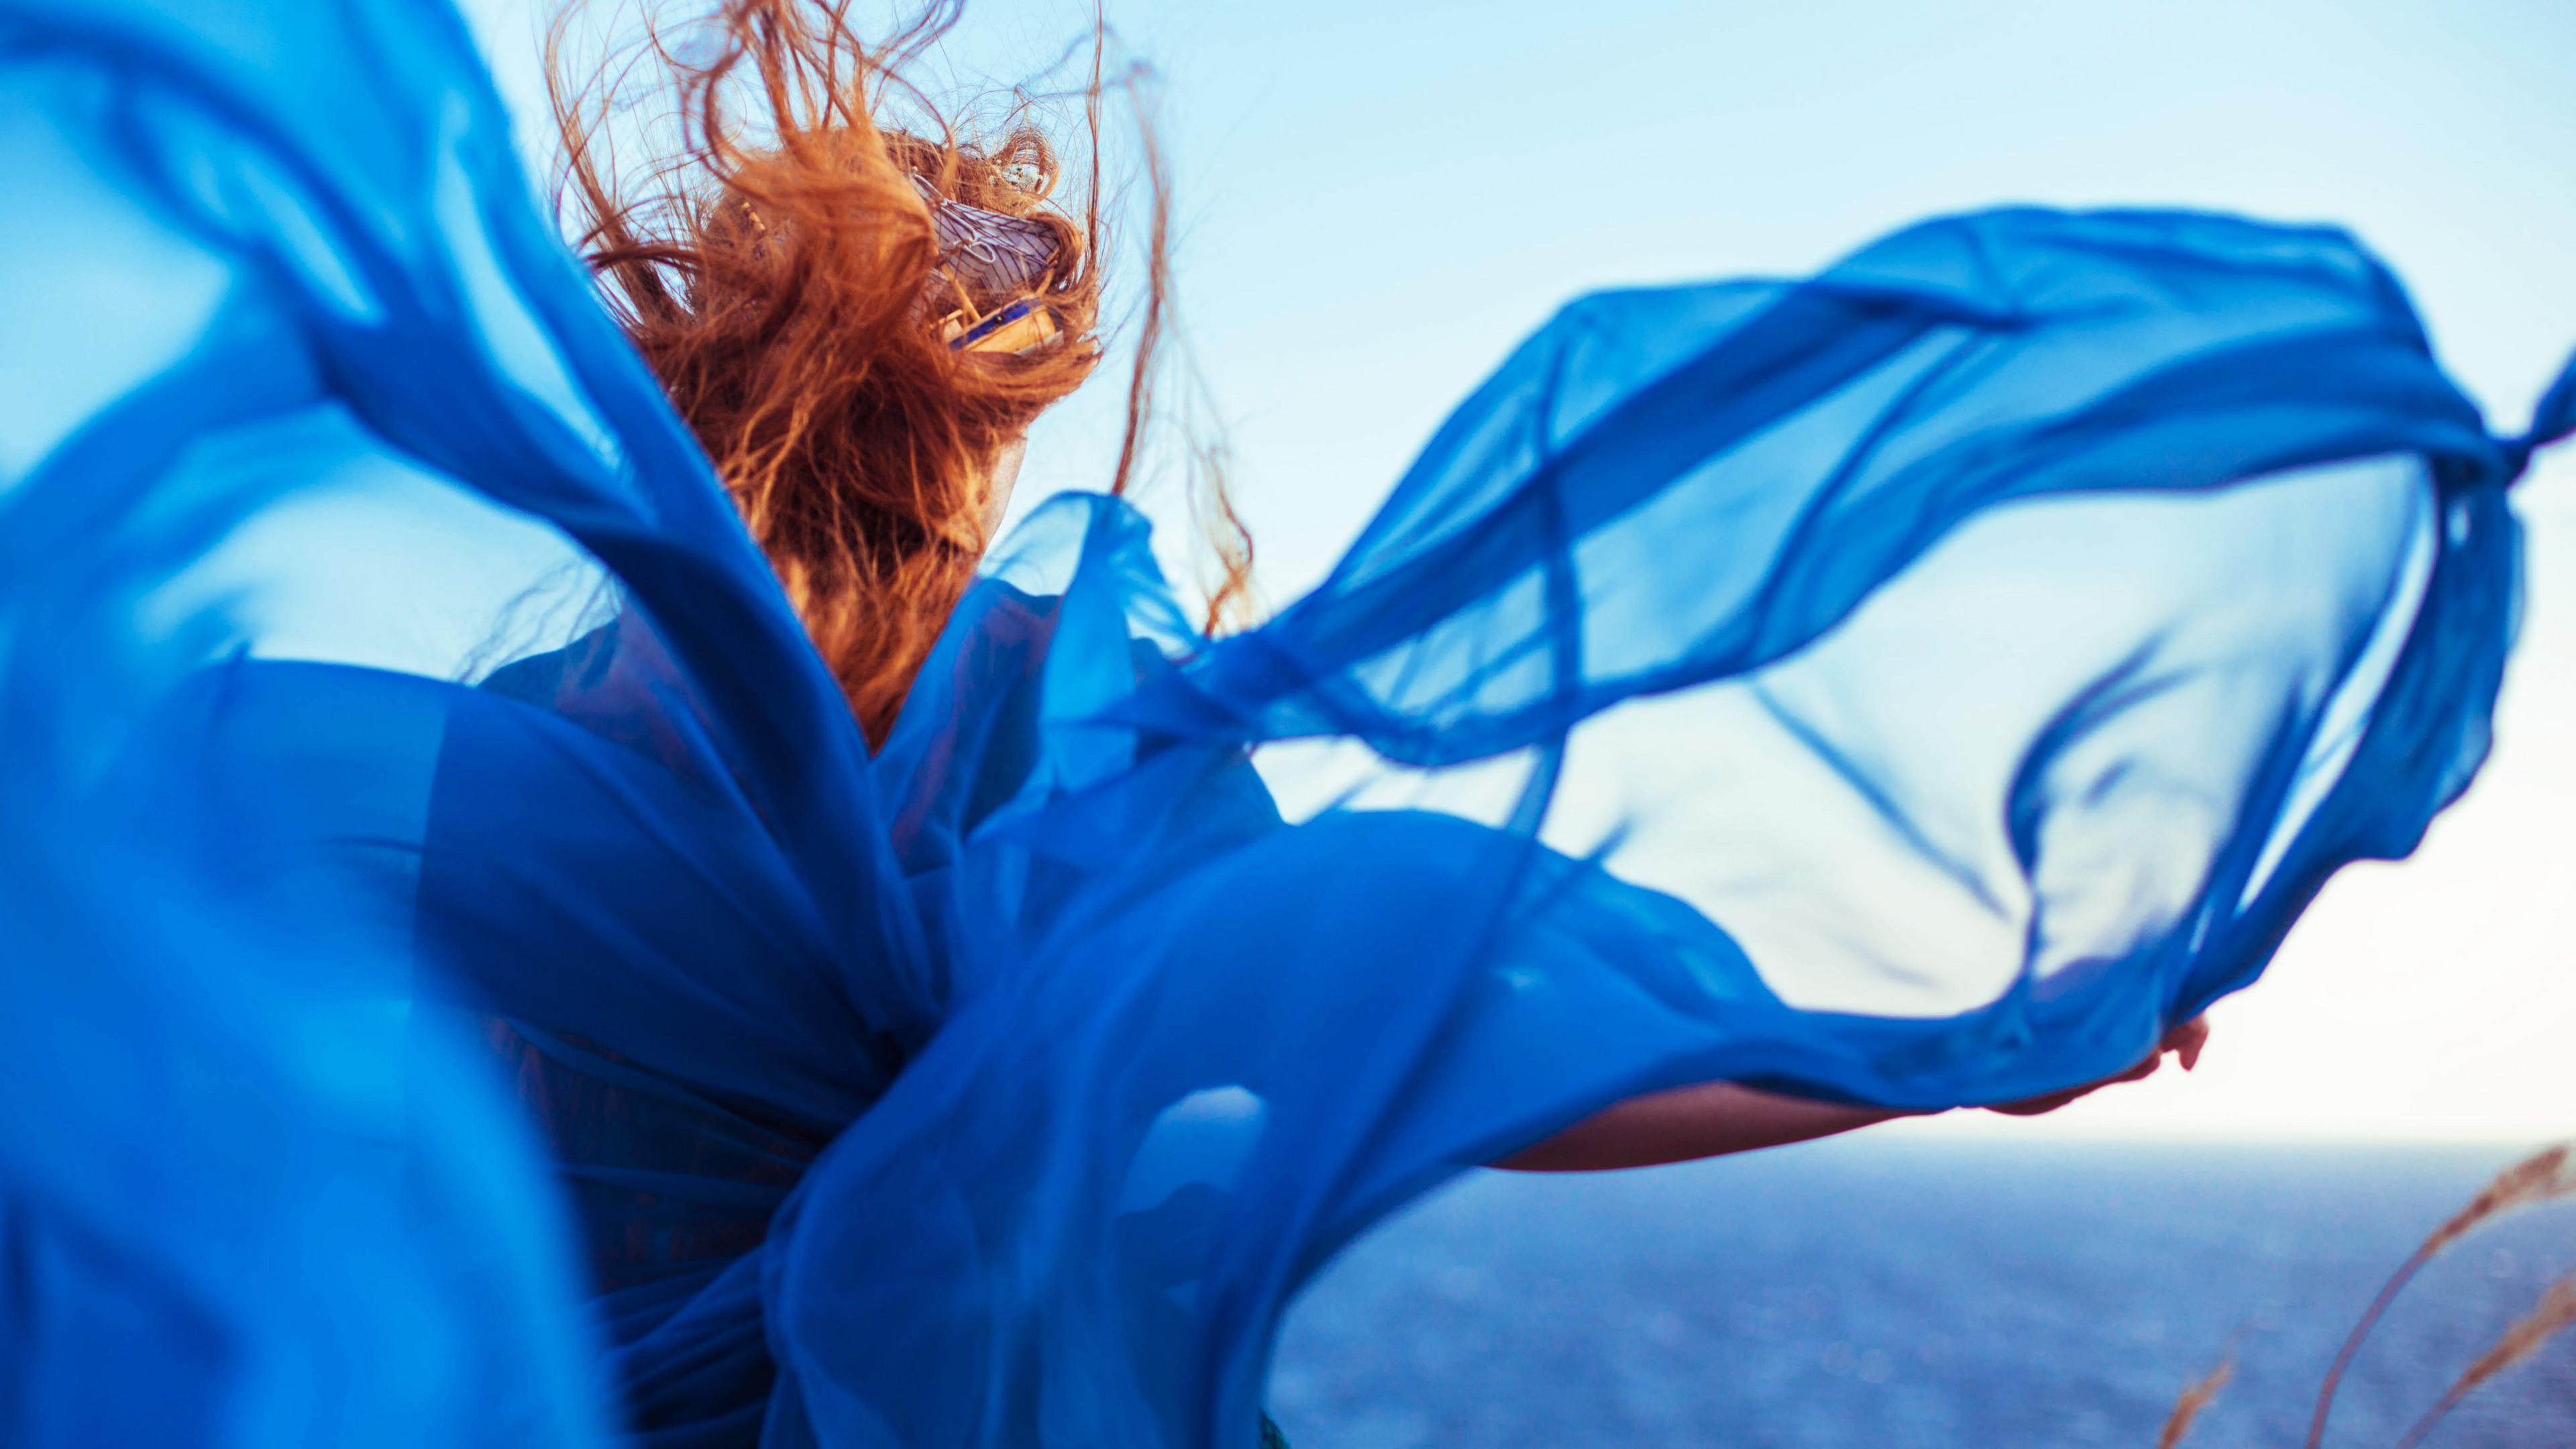 Девушка синий желтый платье без смс